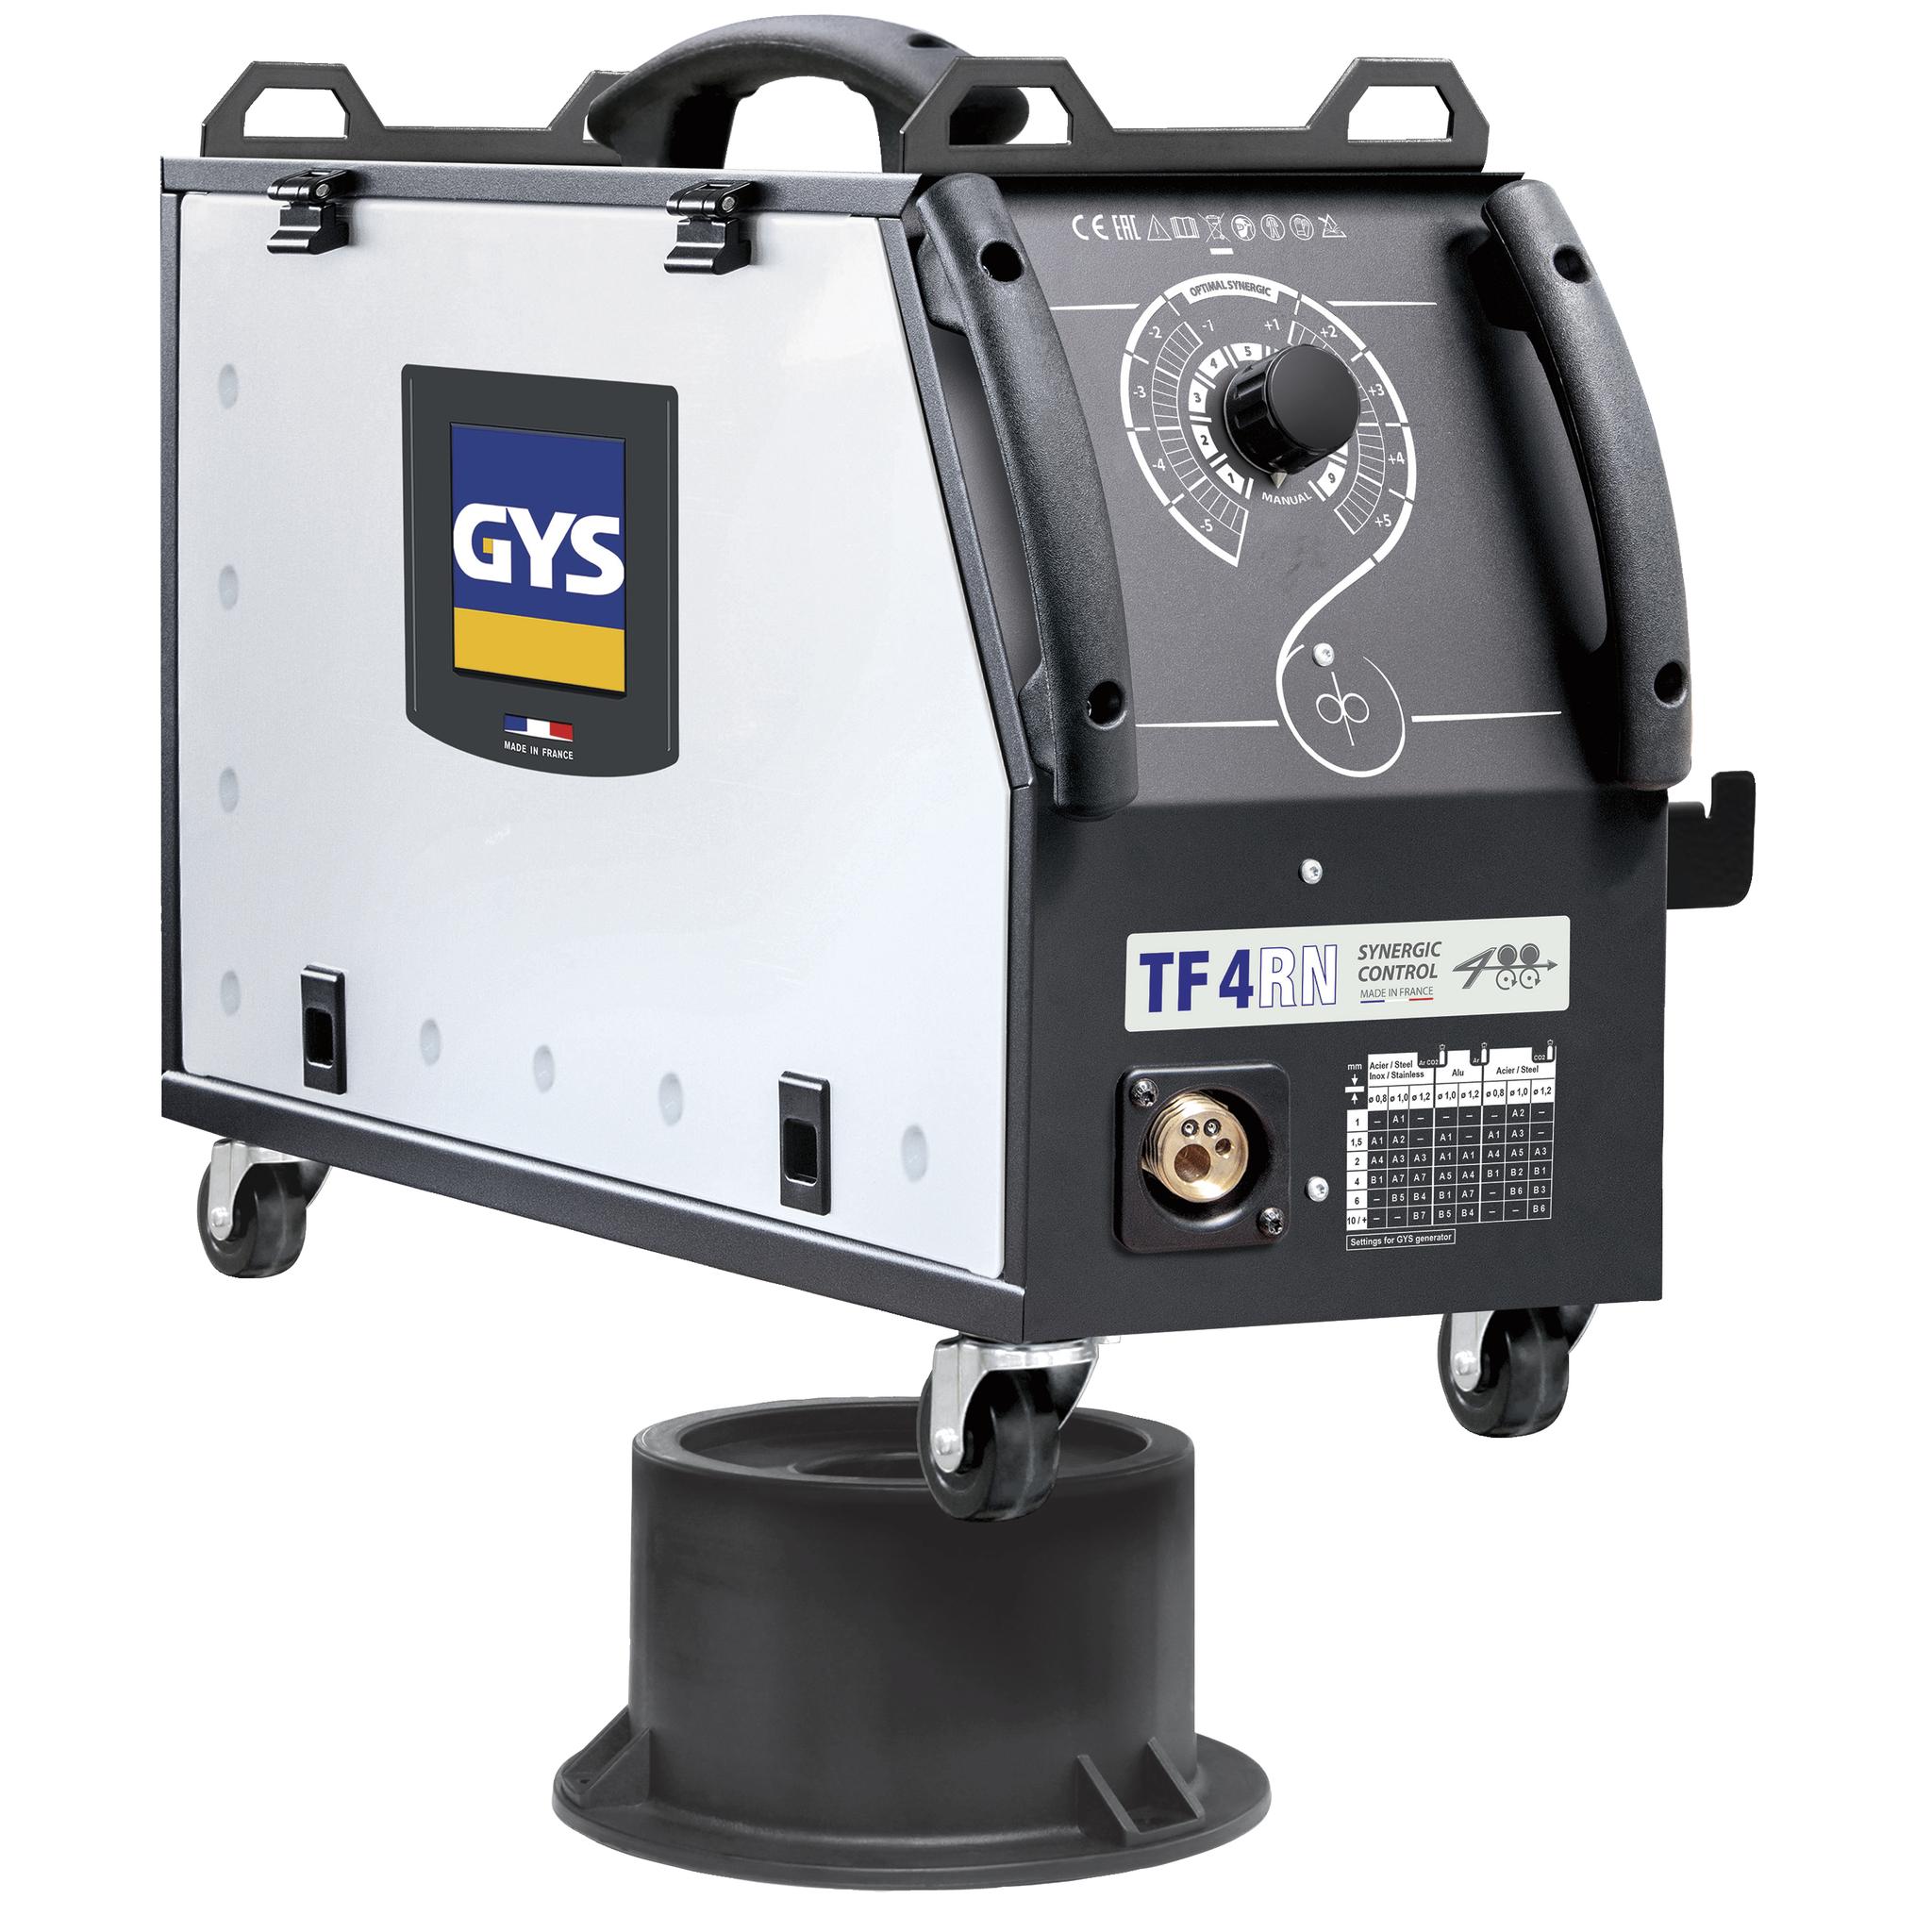 GYS Drahtvorschubkoffer TF 4RN - luftgekühlt 061699